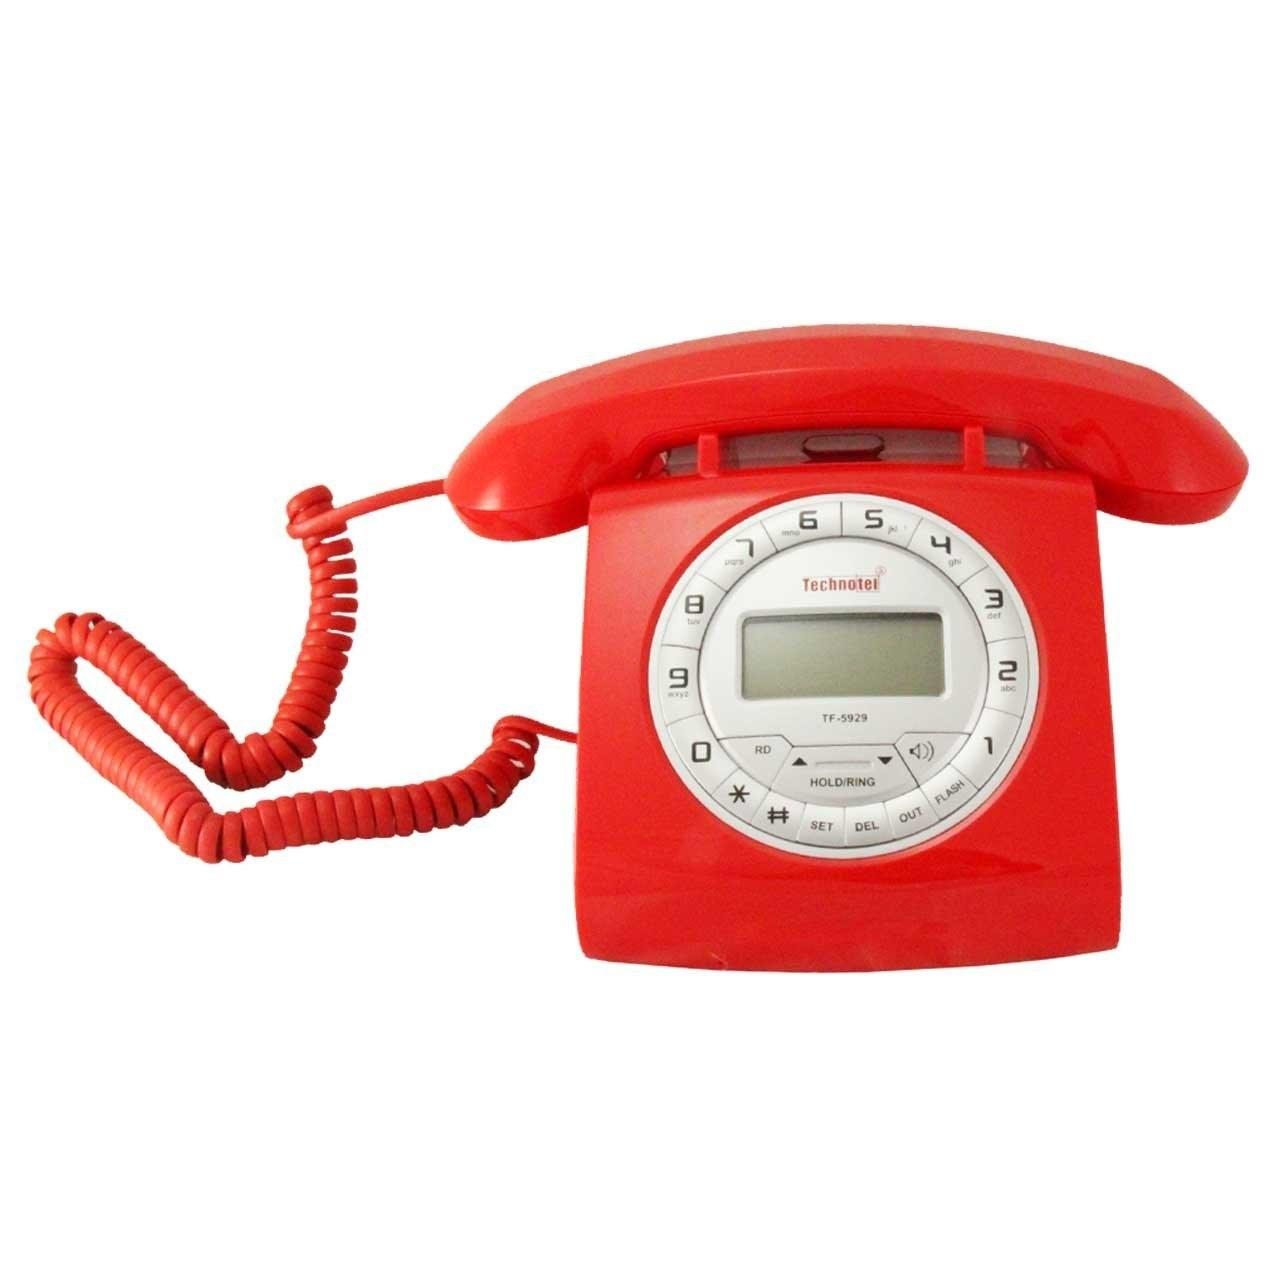 تصویر تلفن تکنوتل مدل 5929 technotel 5929 Phone